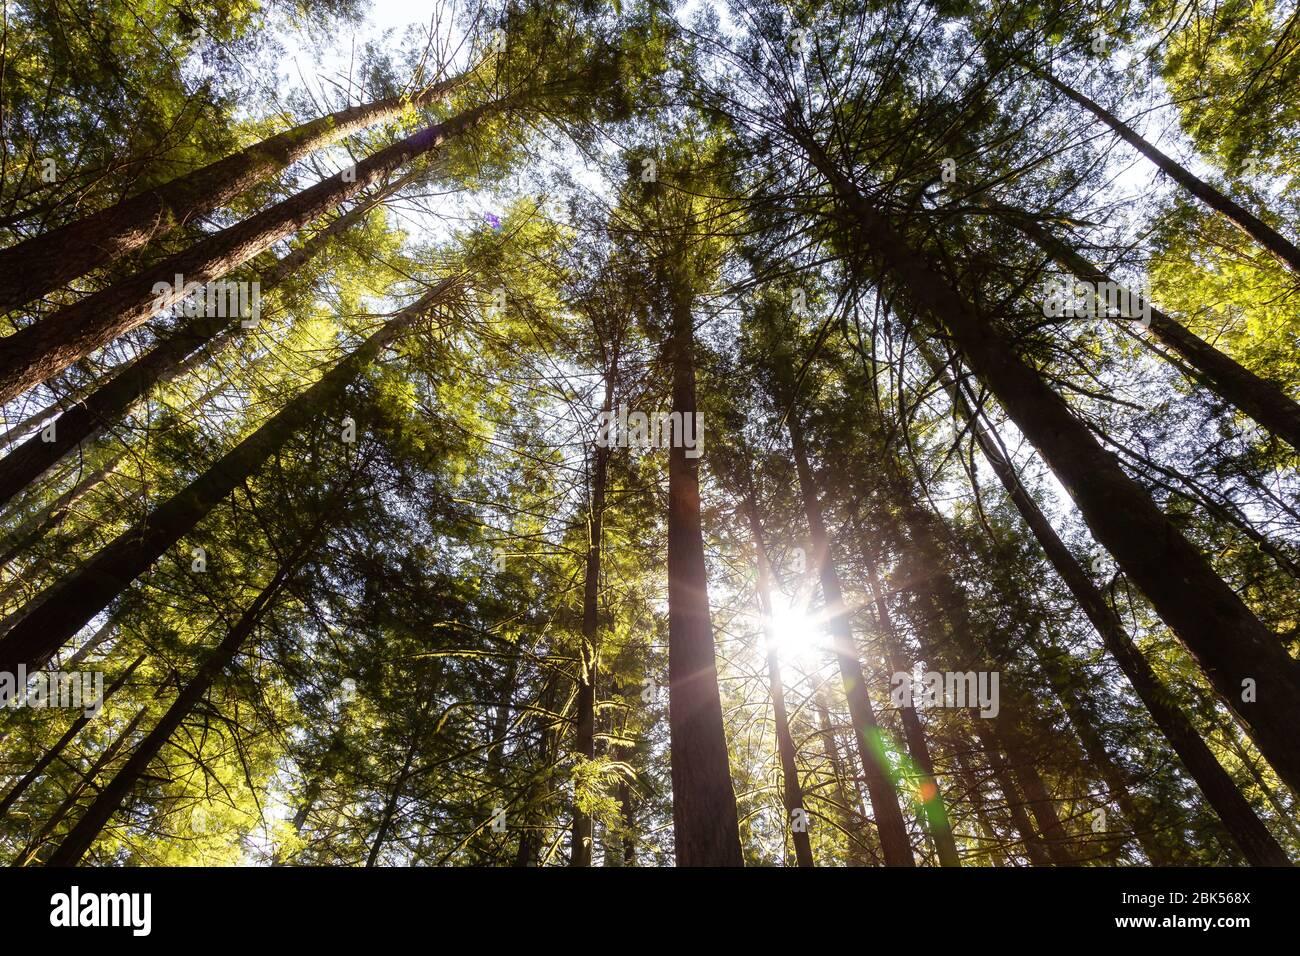 Squamish, near Vancouver, British Columbia, Canada Stock Photo